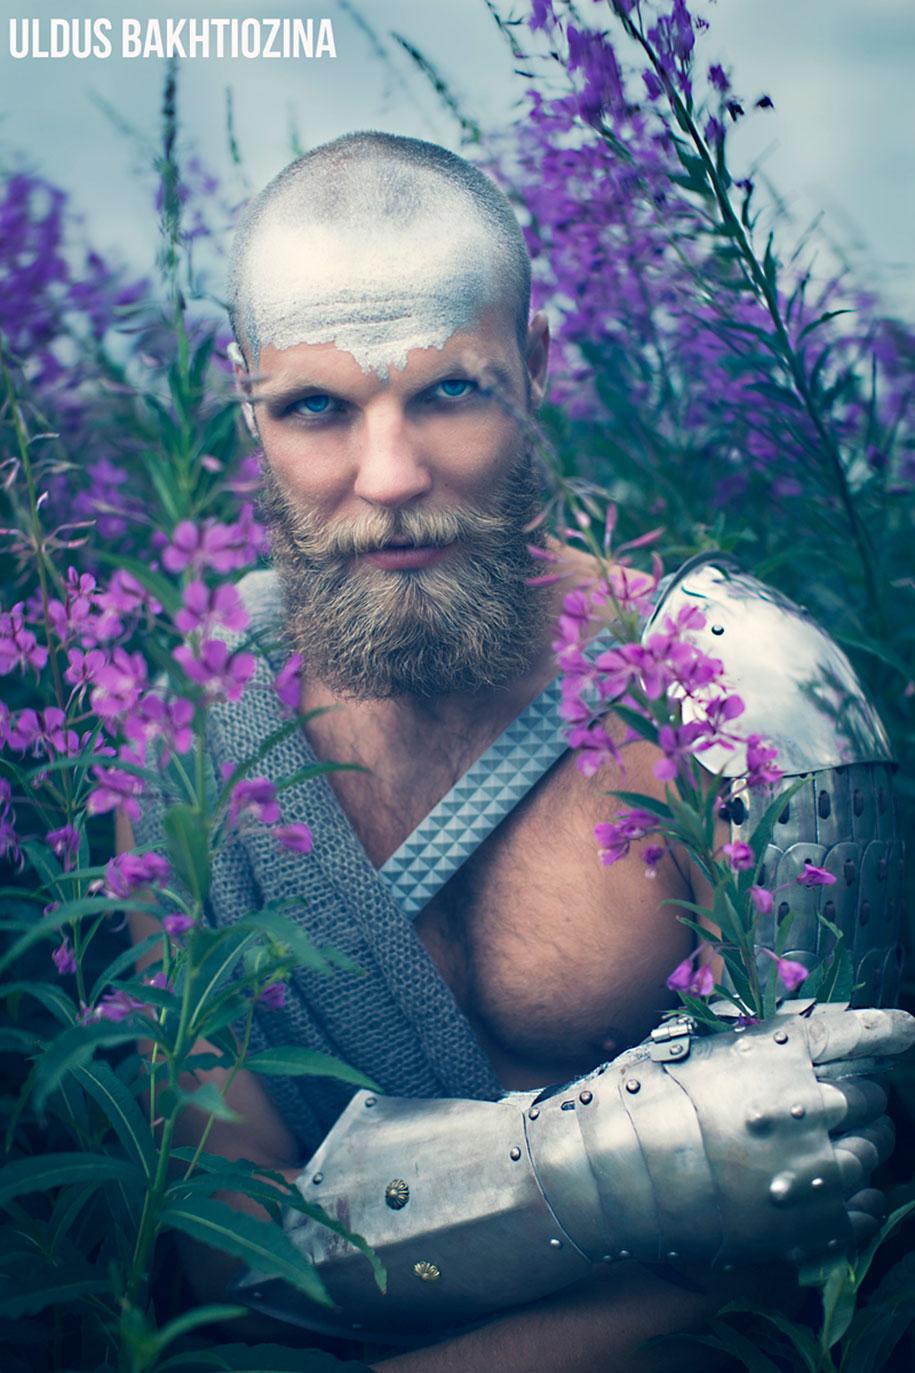 russia-fairytale-portrait-photography-uldus-bakhtiozina-18